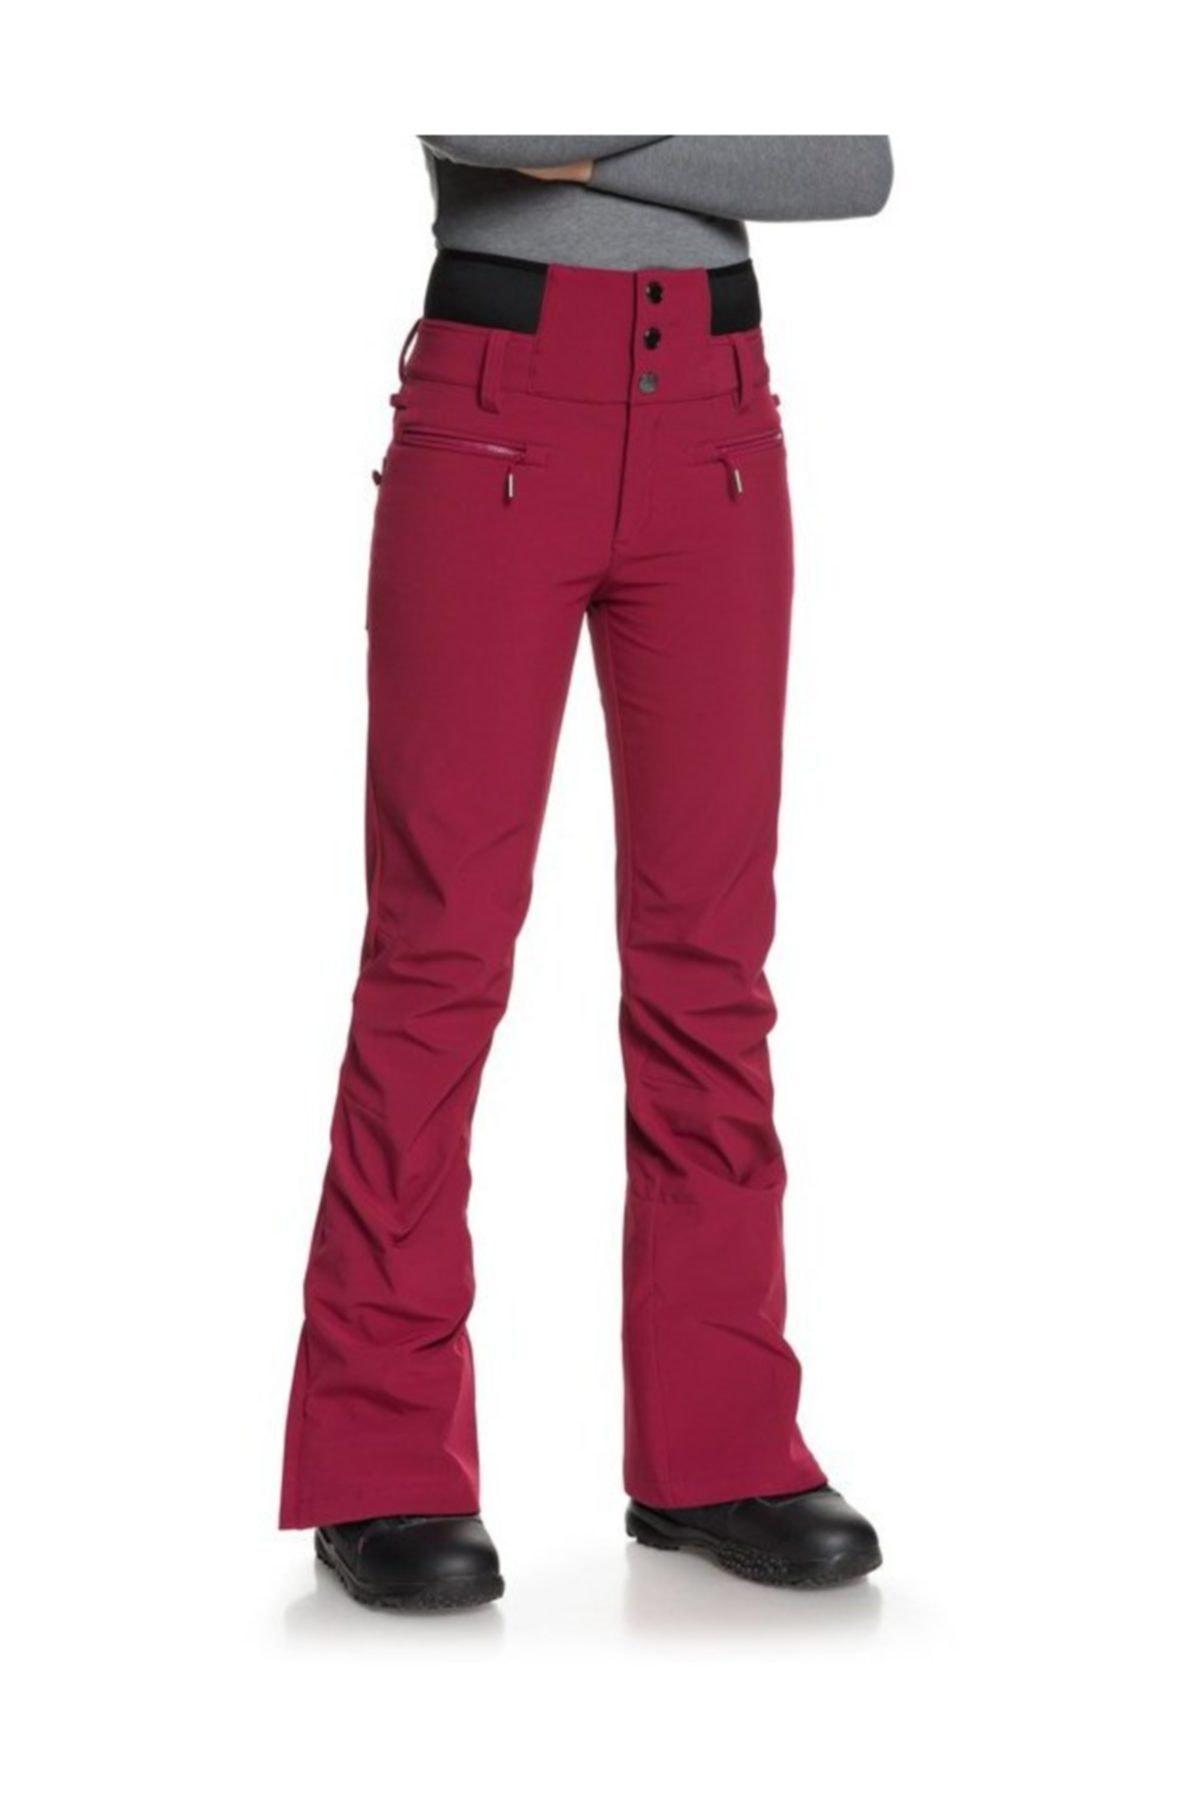 Roxy Rising High Snow Kadın Pantolon ERJTP03067 2